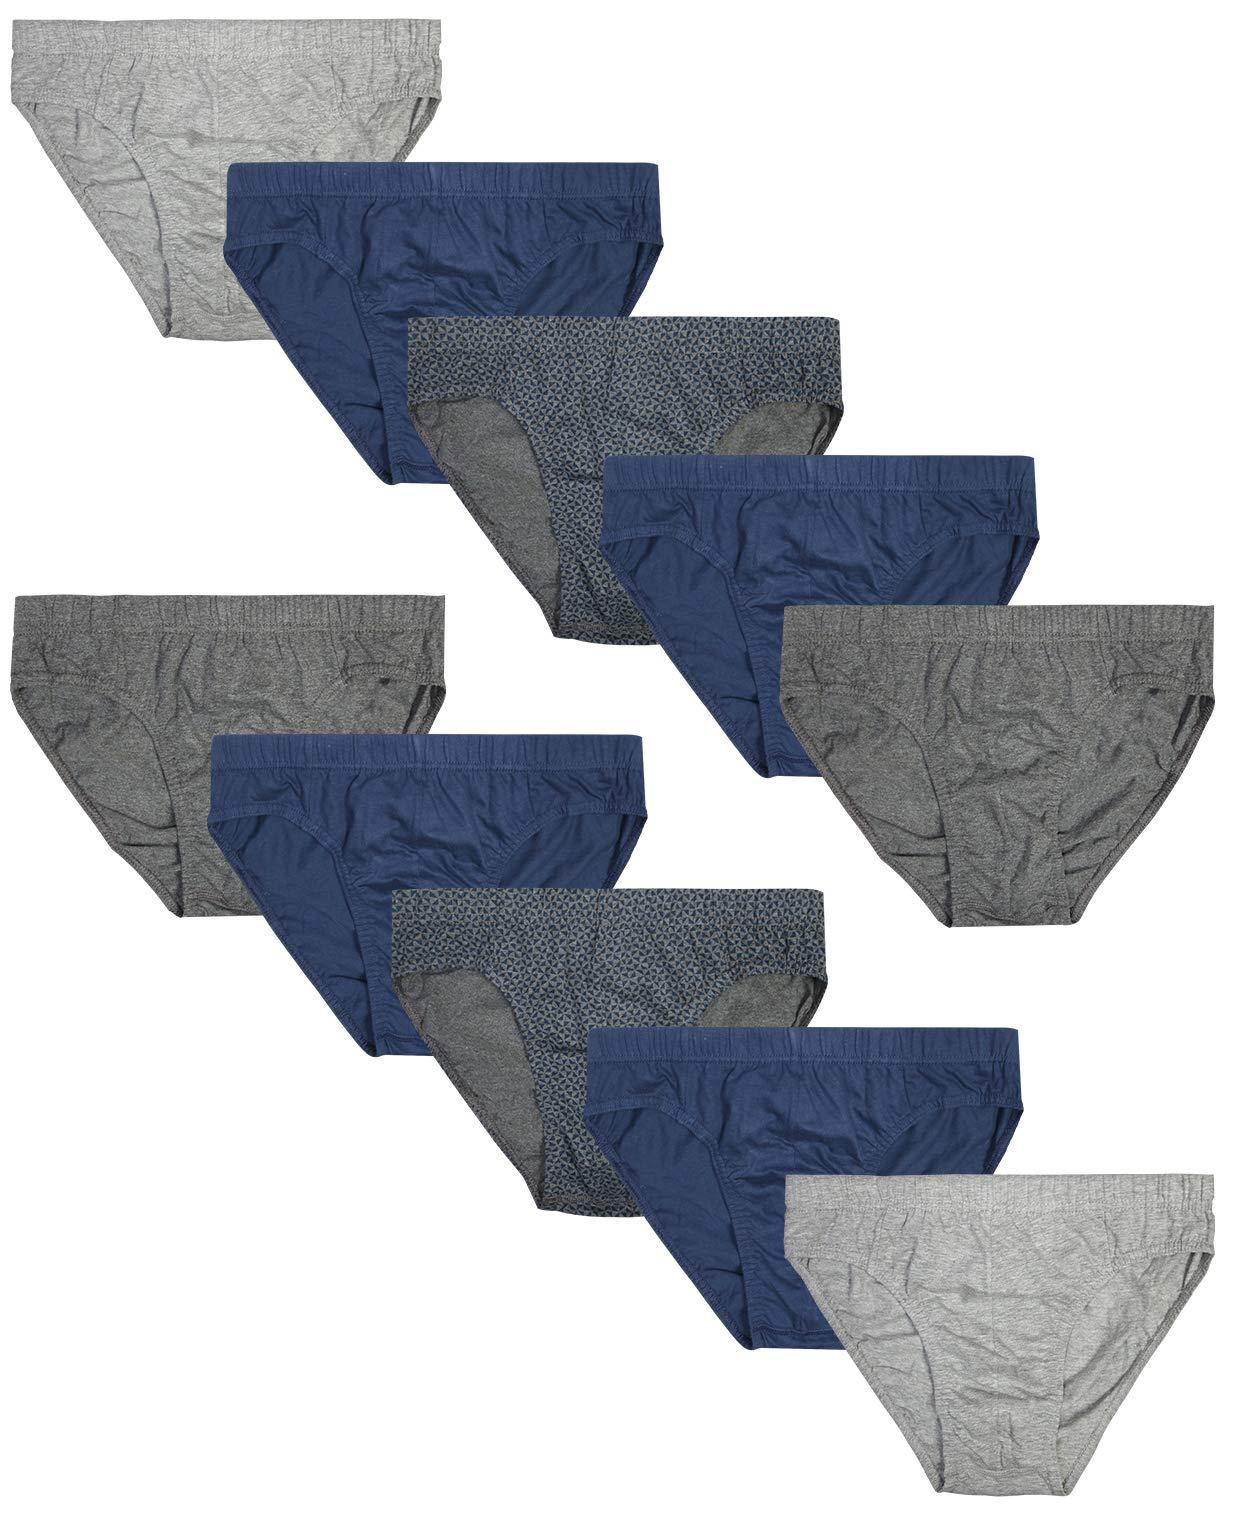 Beverly Hills Polo Club Men's Low Rise Brief Underwear, Solid Triangle, Medium (32-34)'